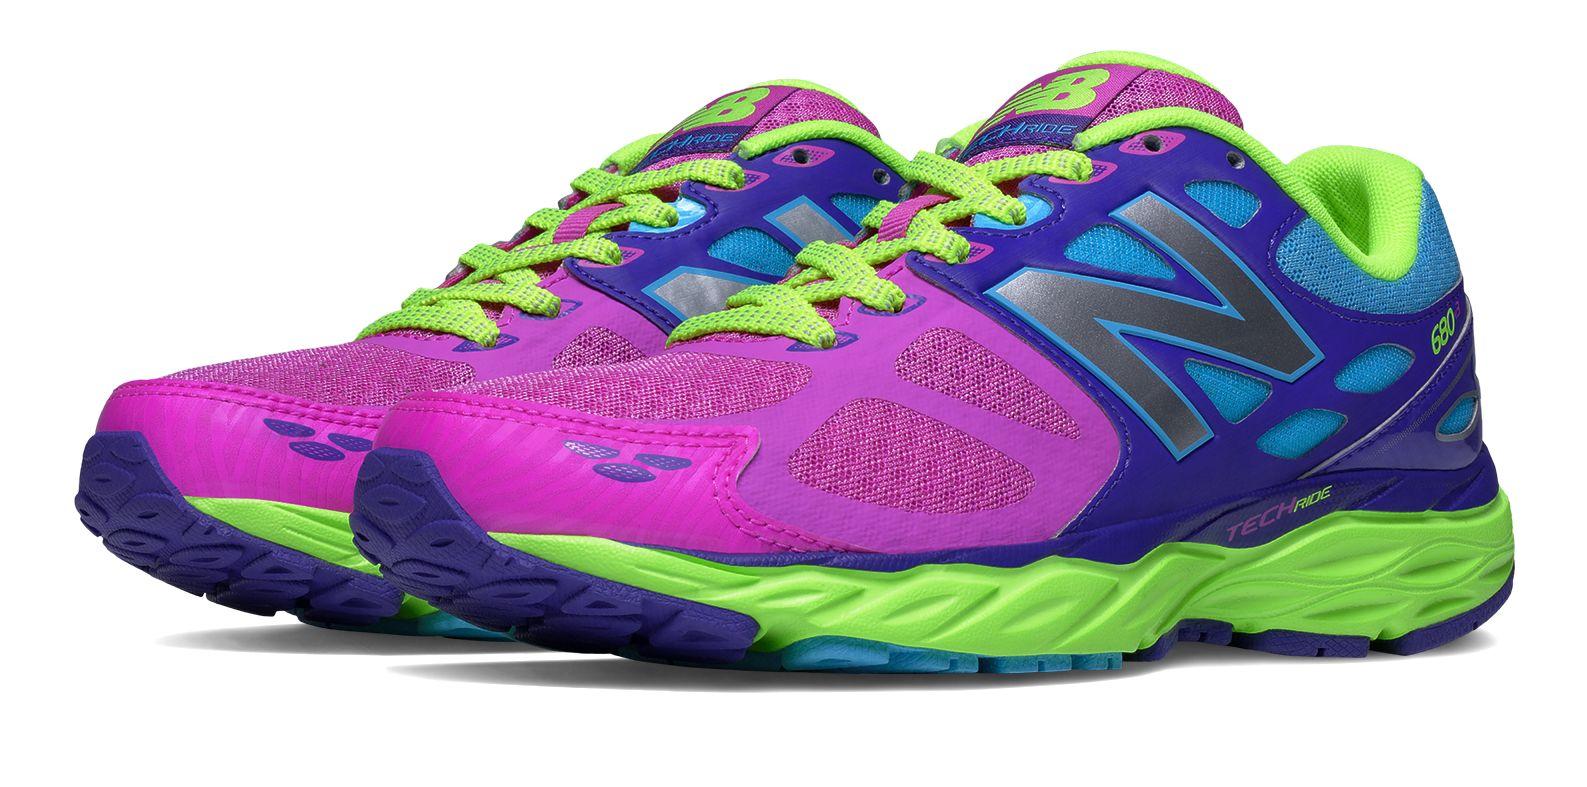 new balance 880v7 women s. new balance 680v3 womens shoes purple with pink 880v7 women s